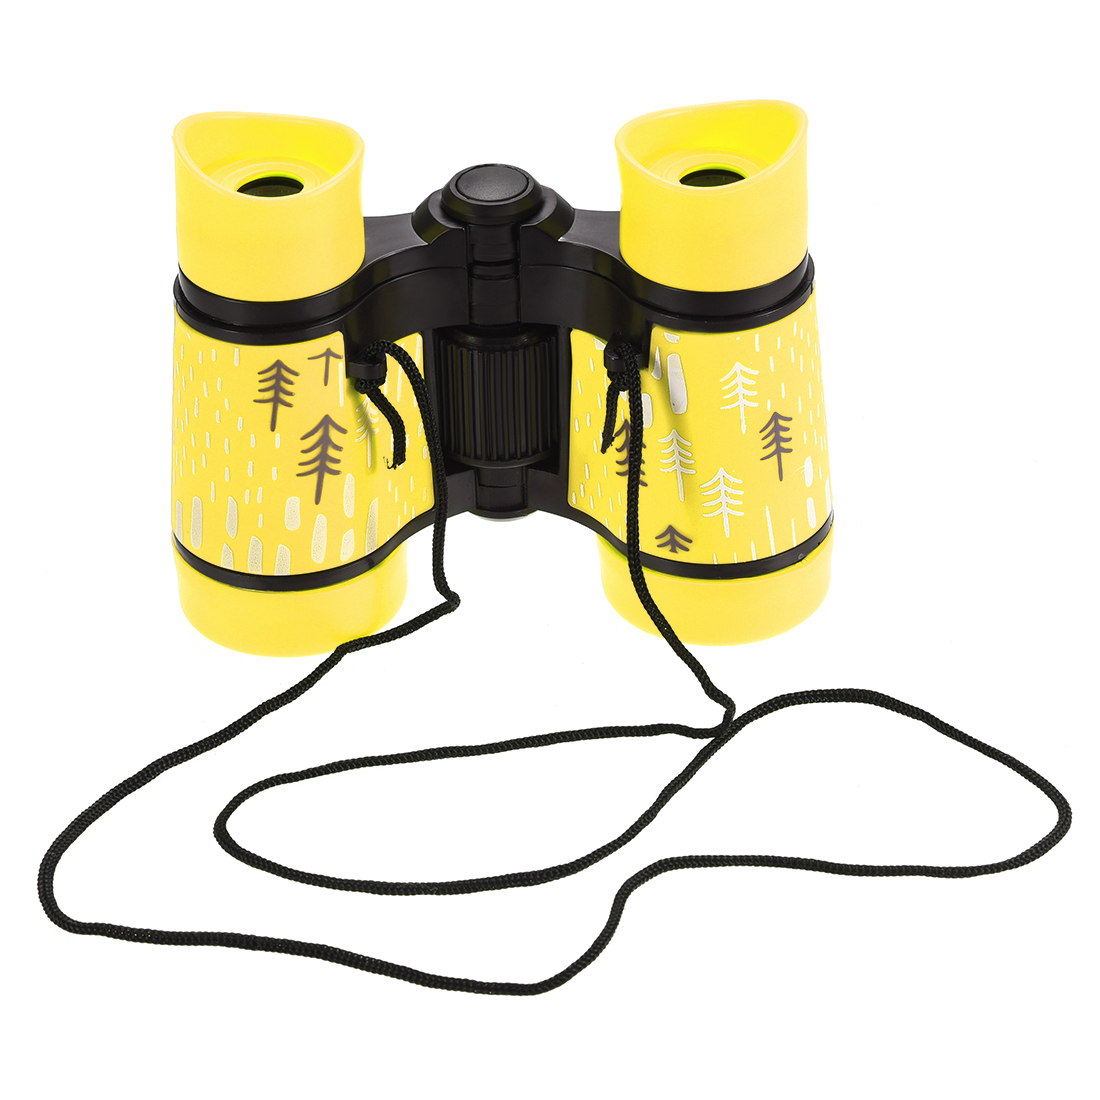 Toy Binoculars 4X30 Compact Folding Binoculars Shockproof Yellow with Neck Strap